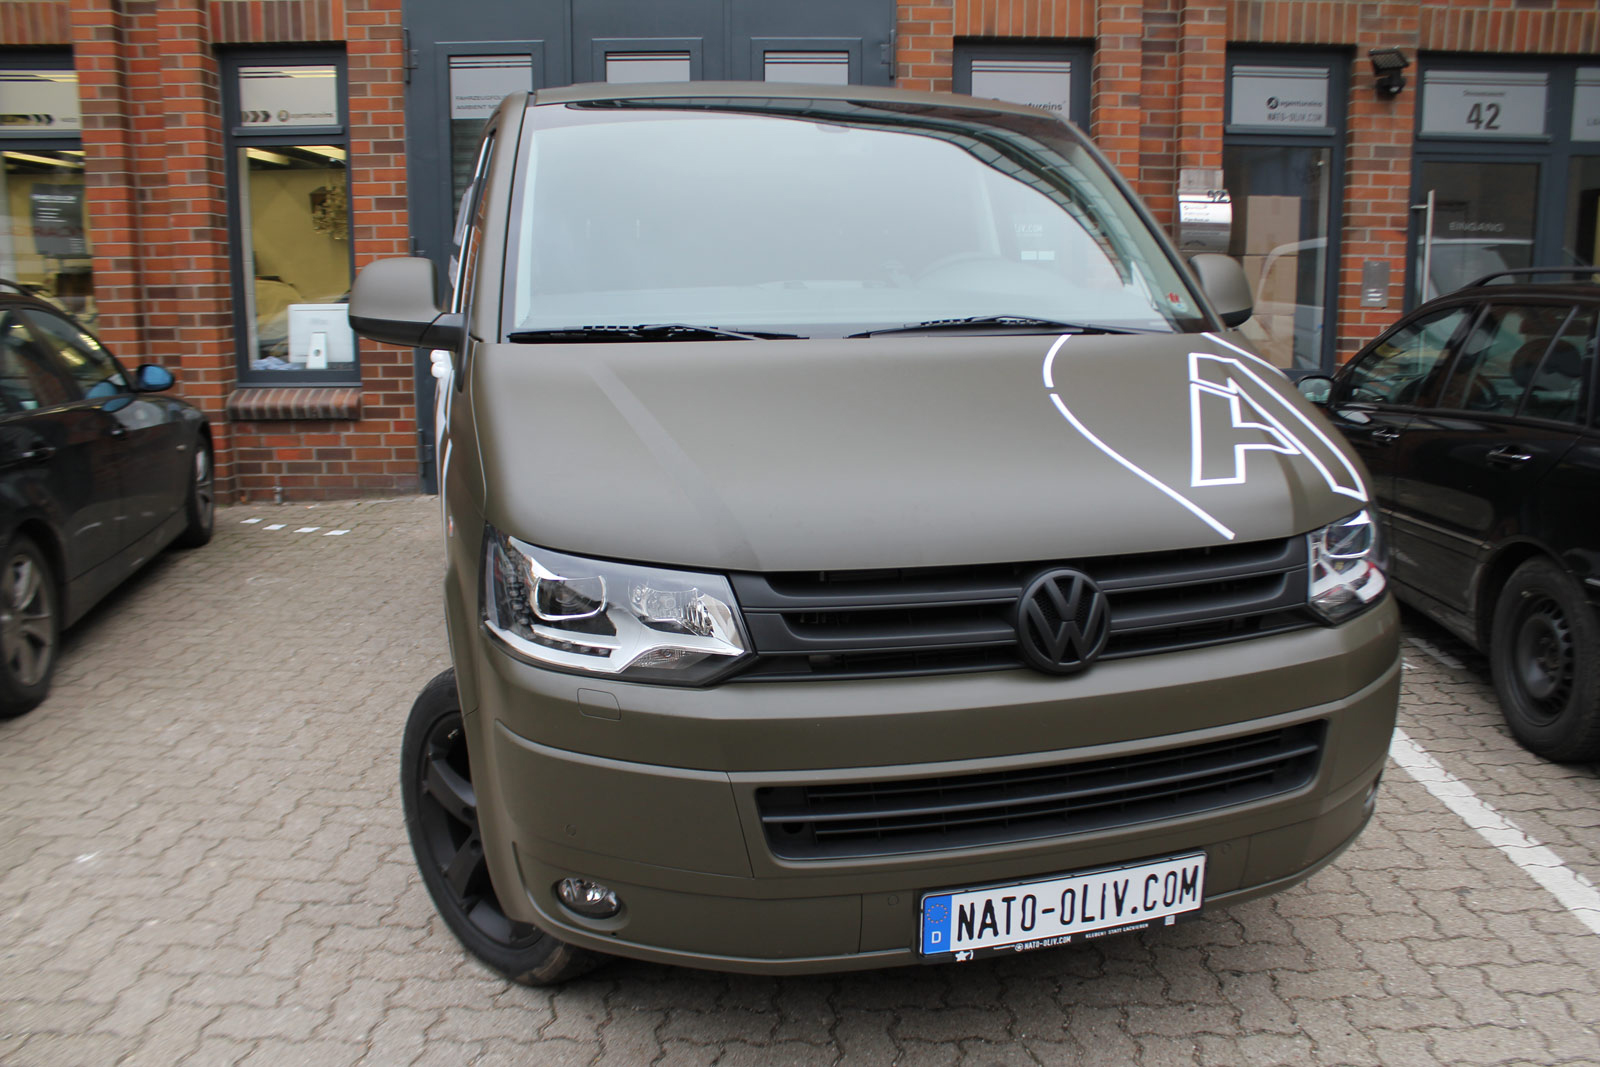 VW_T5_VOLLFOLIERUNG_NATO-OLIV_07